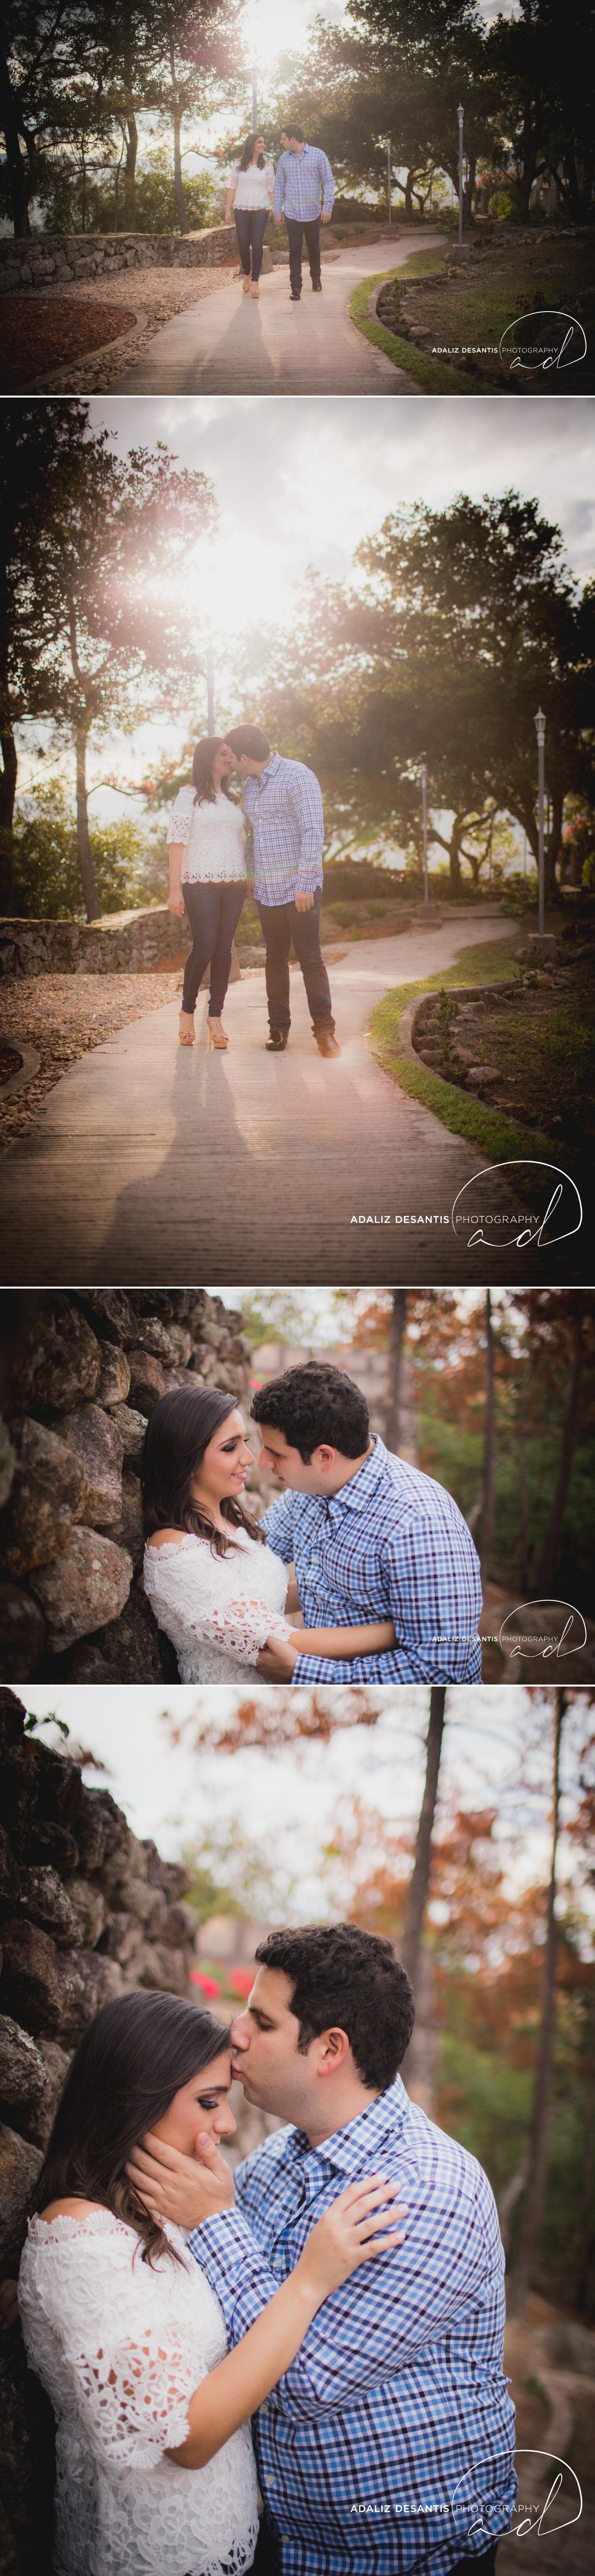 Lorette y Roger Engaged 6